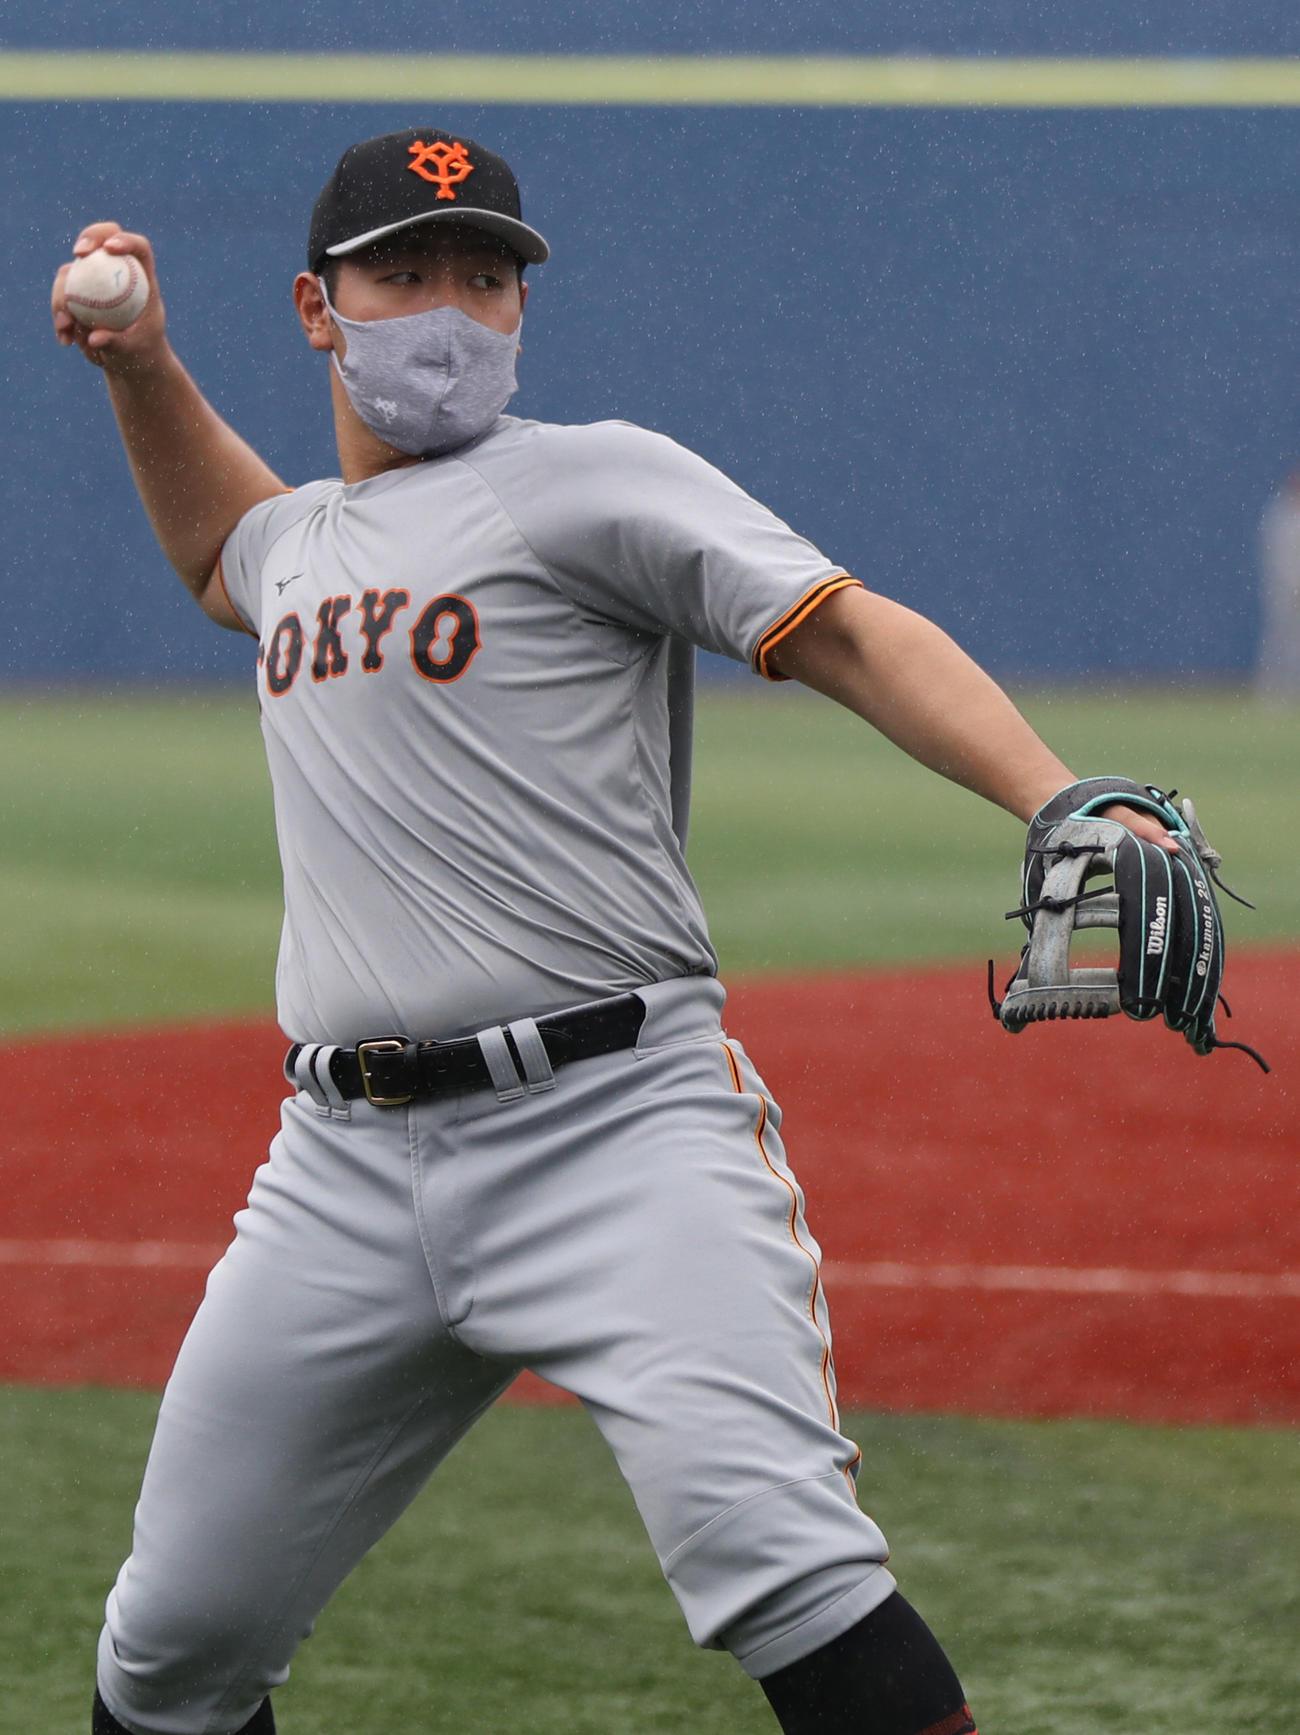 DeNA対巨人 雨の横浜スタジアムでキャッチボールをする岡本和(撮影・狩俣裕三)